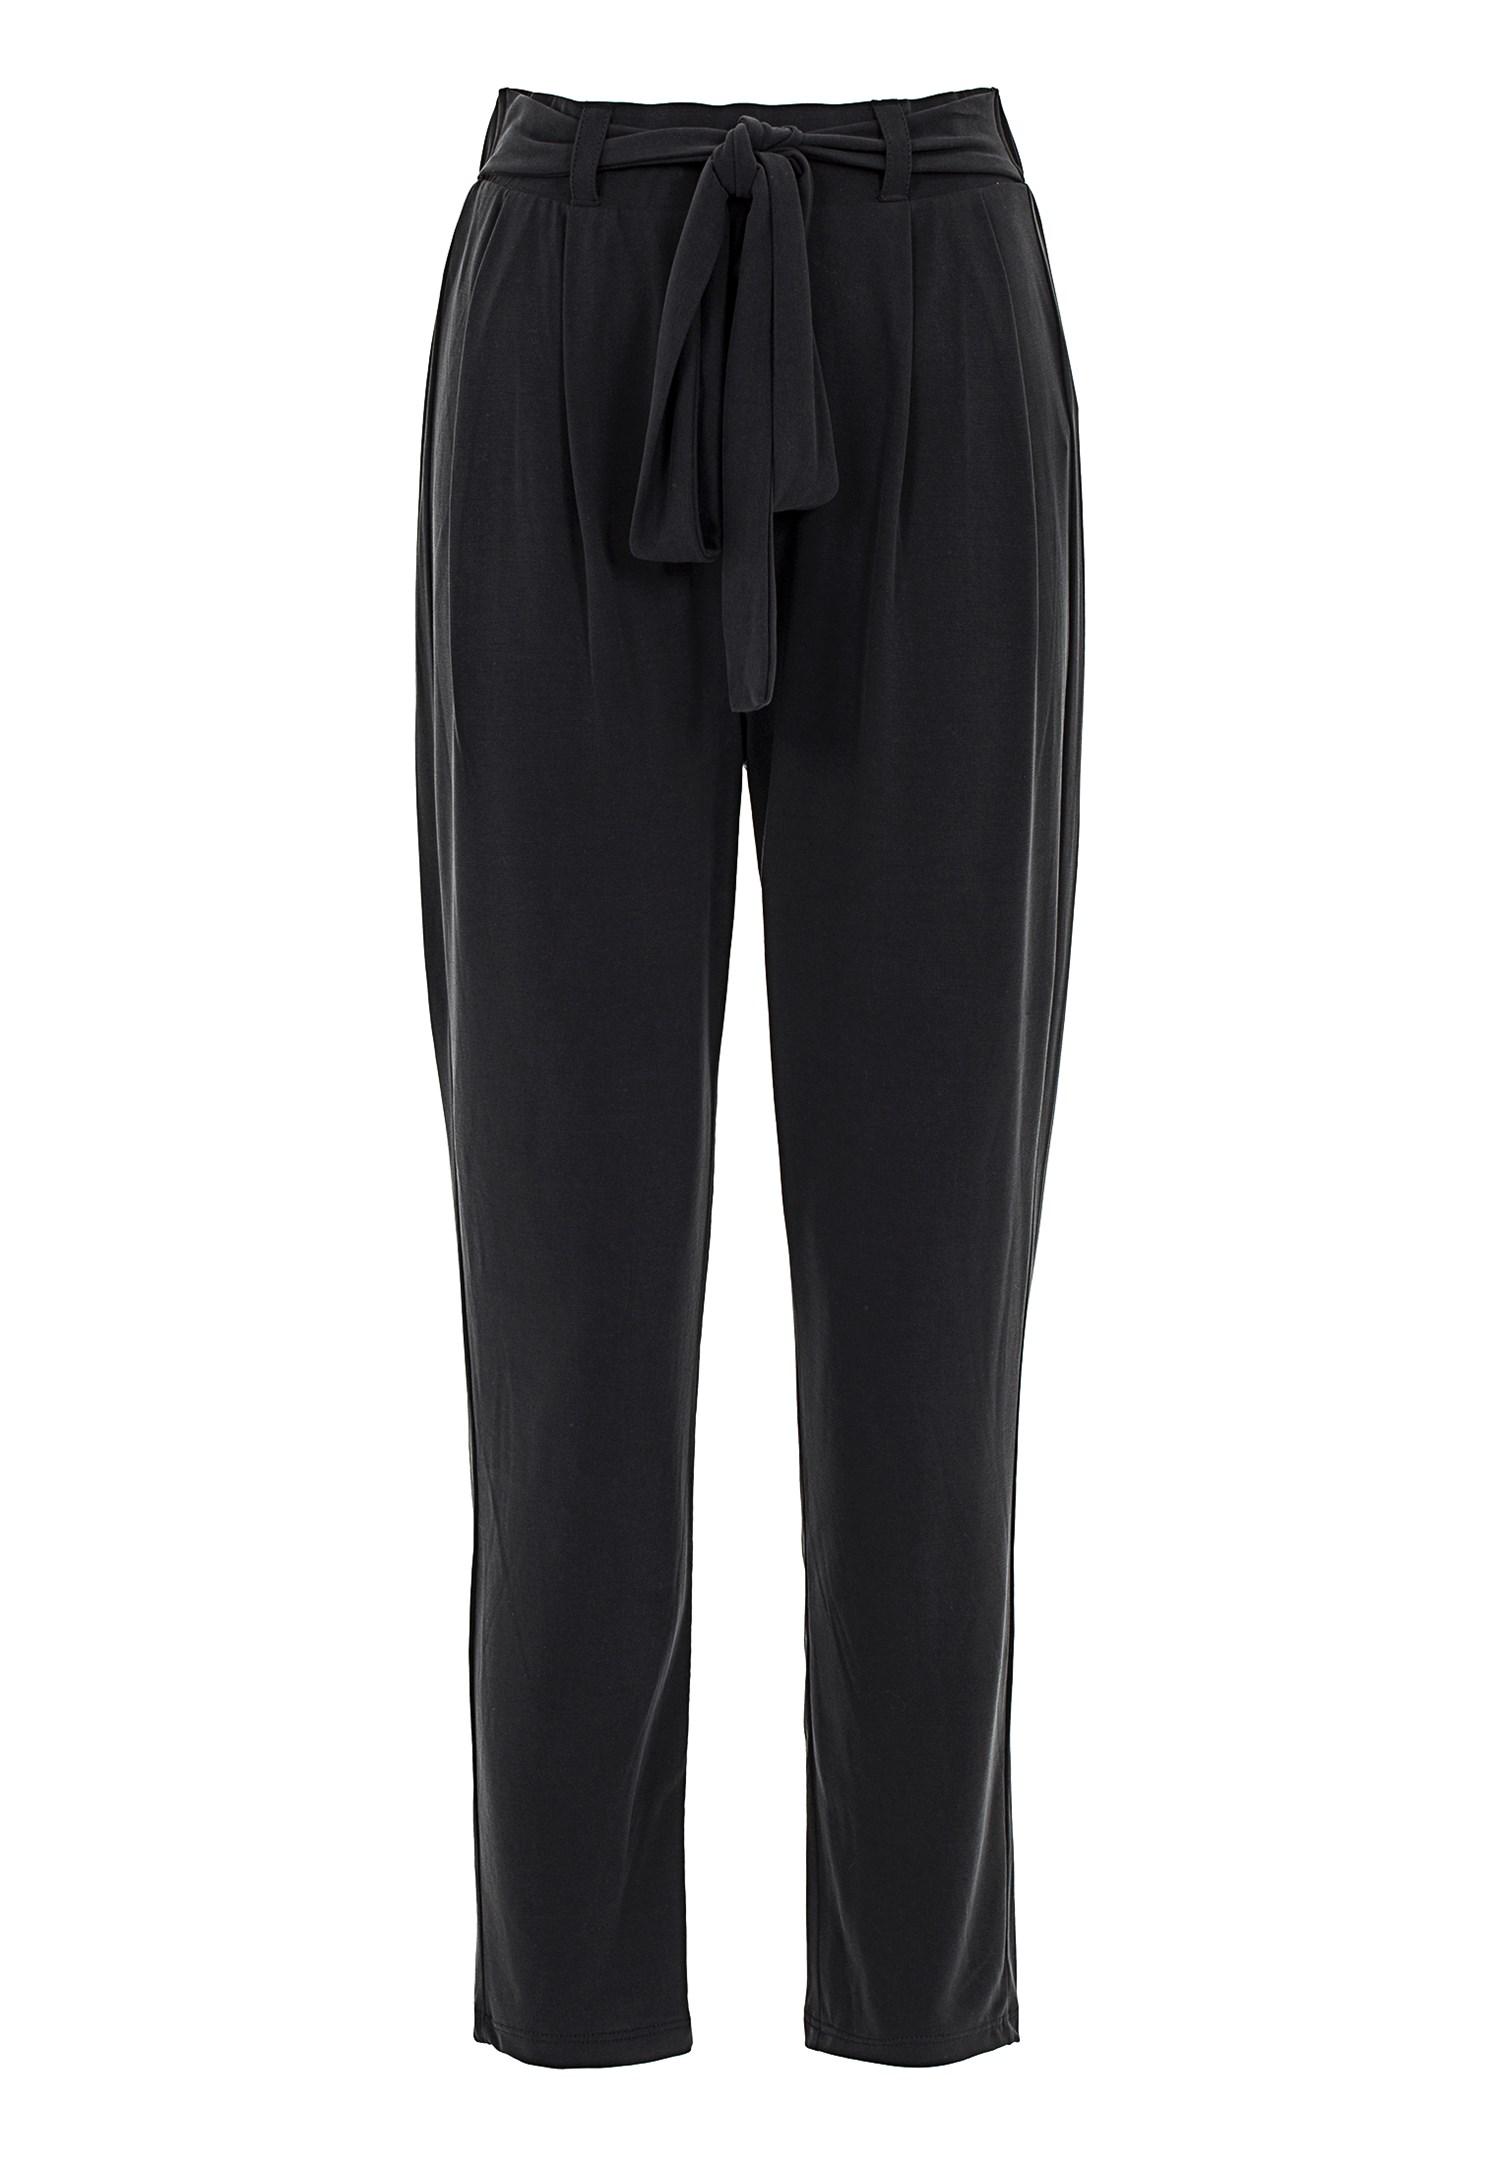 Bayan Siyah Yumuşak Dokulu Orta Bel Pantolon